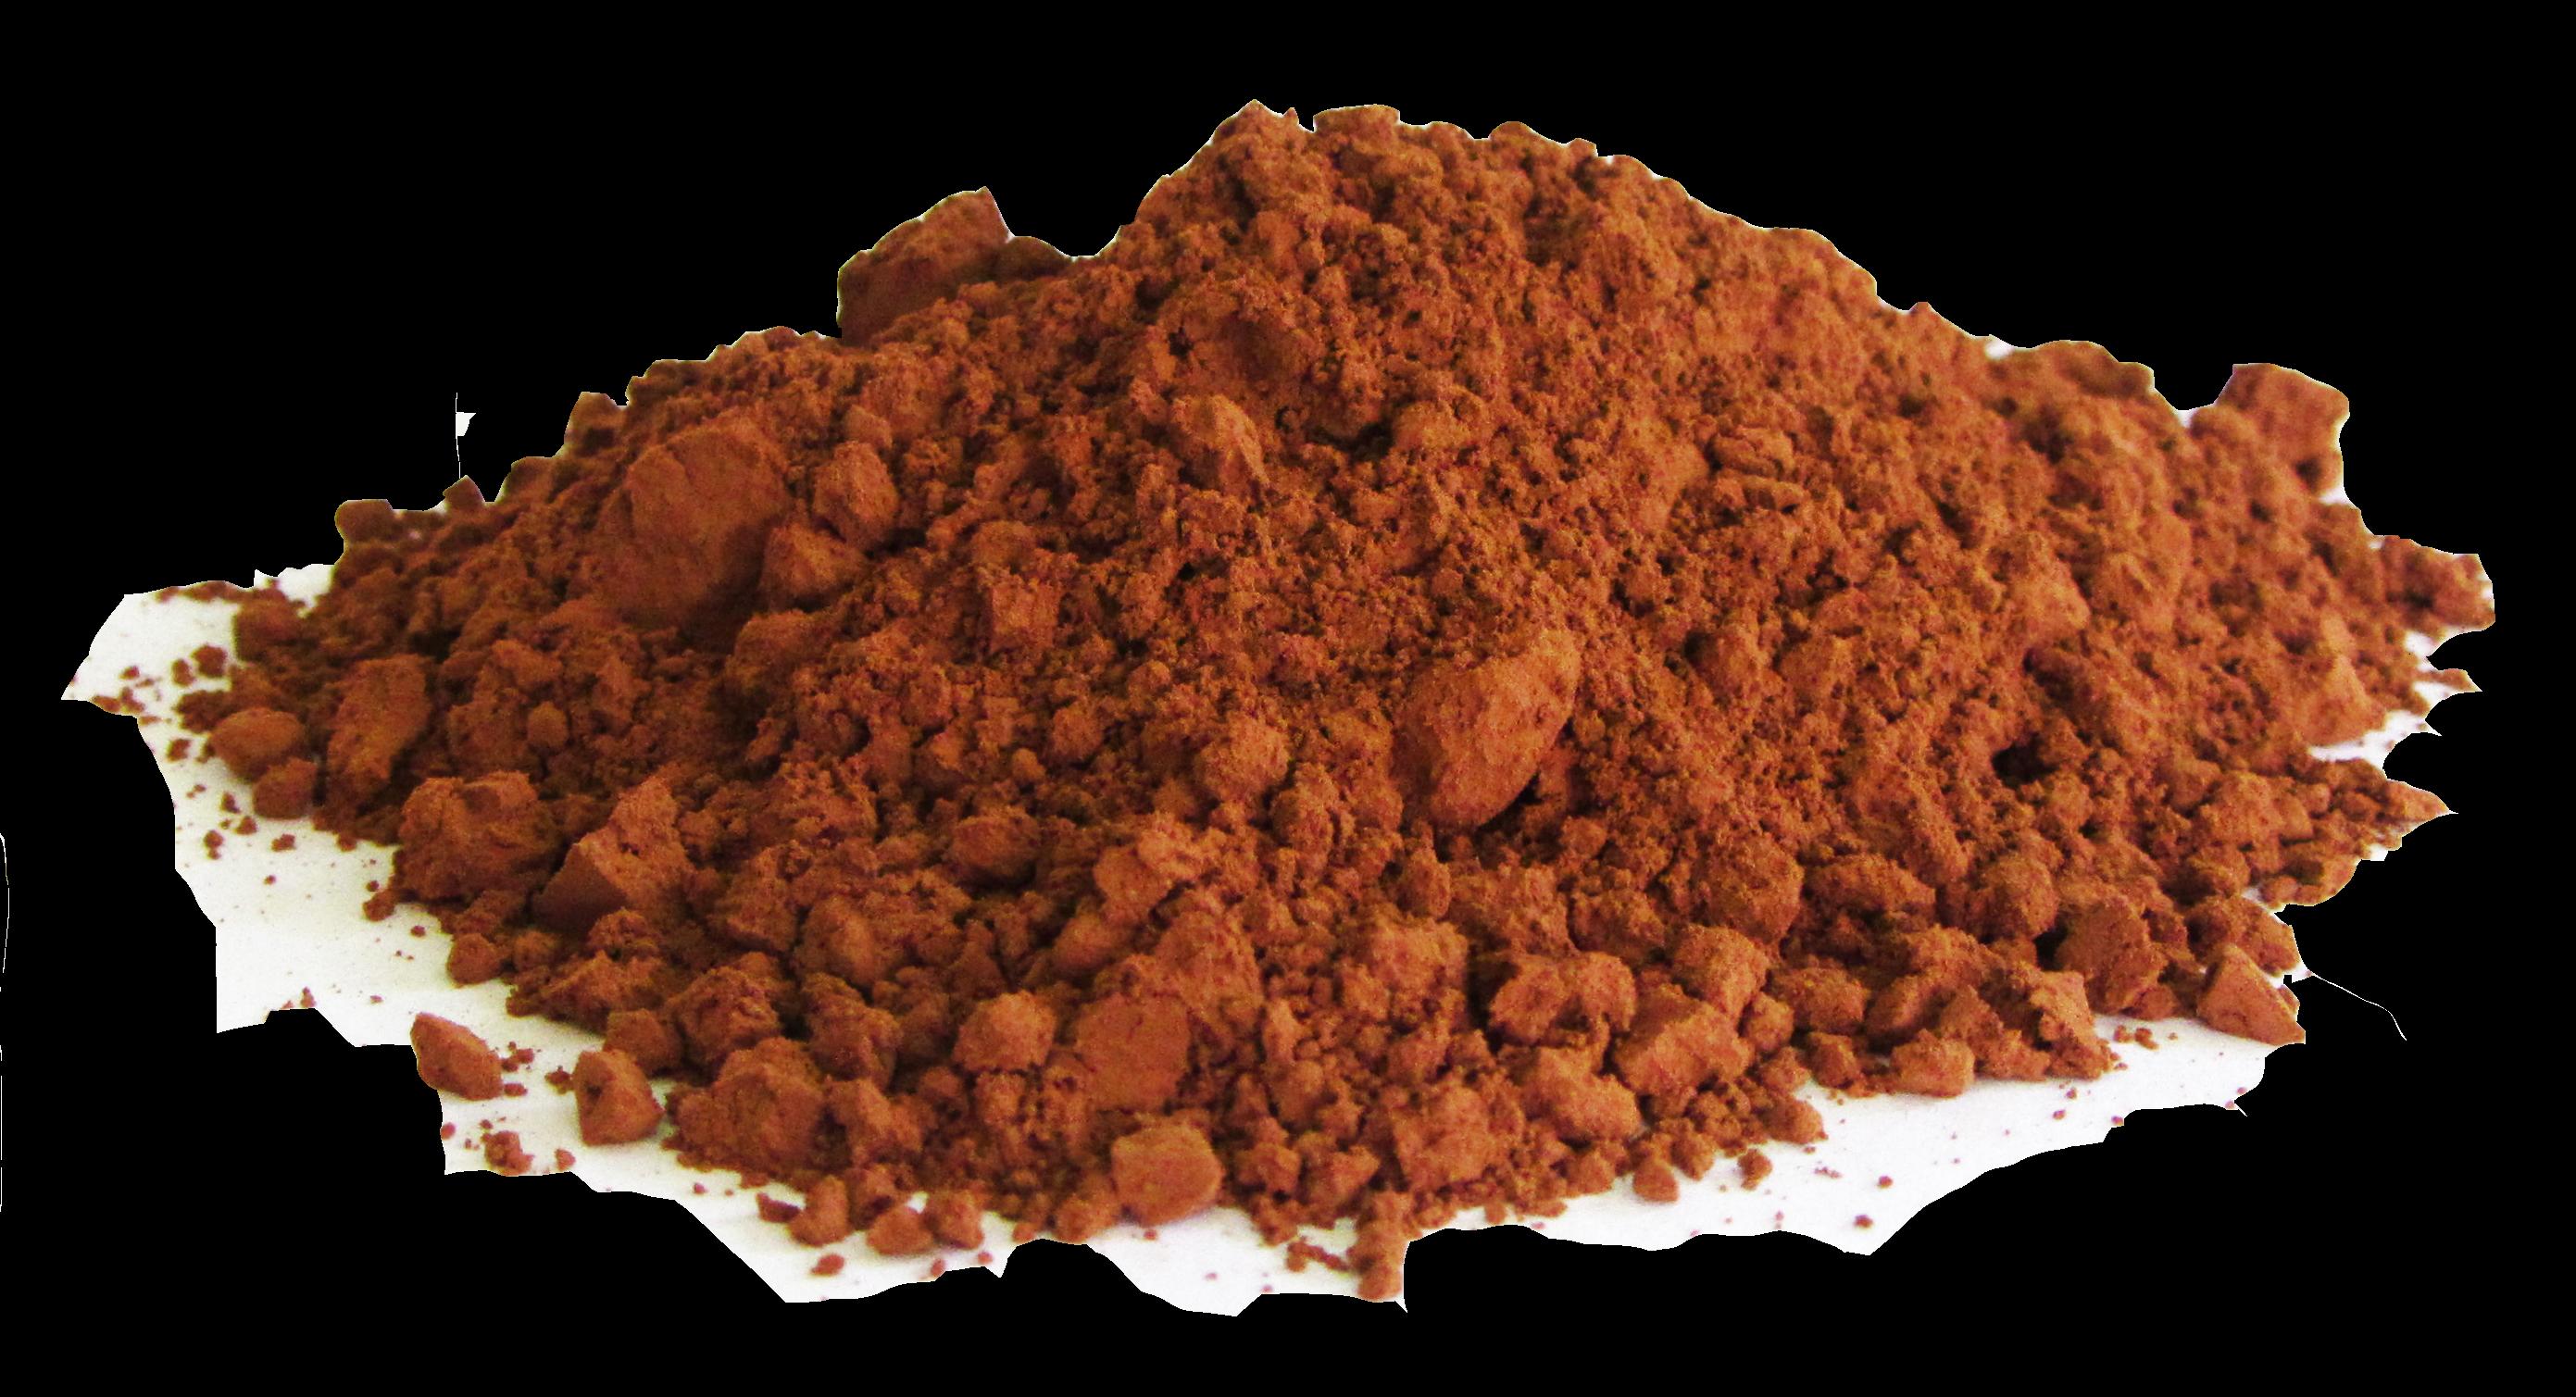 Chocolate PNG Image.